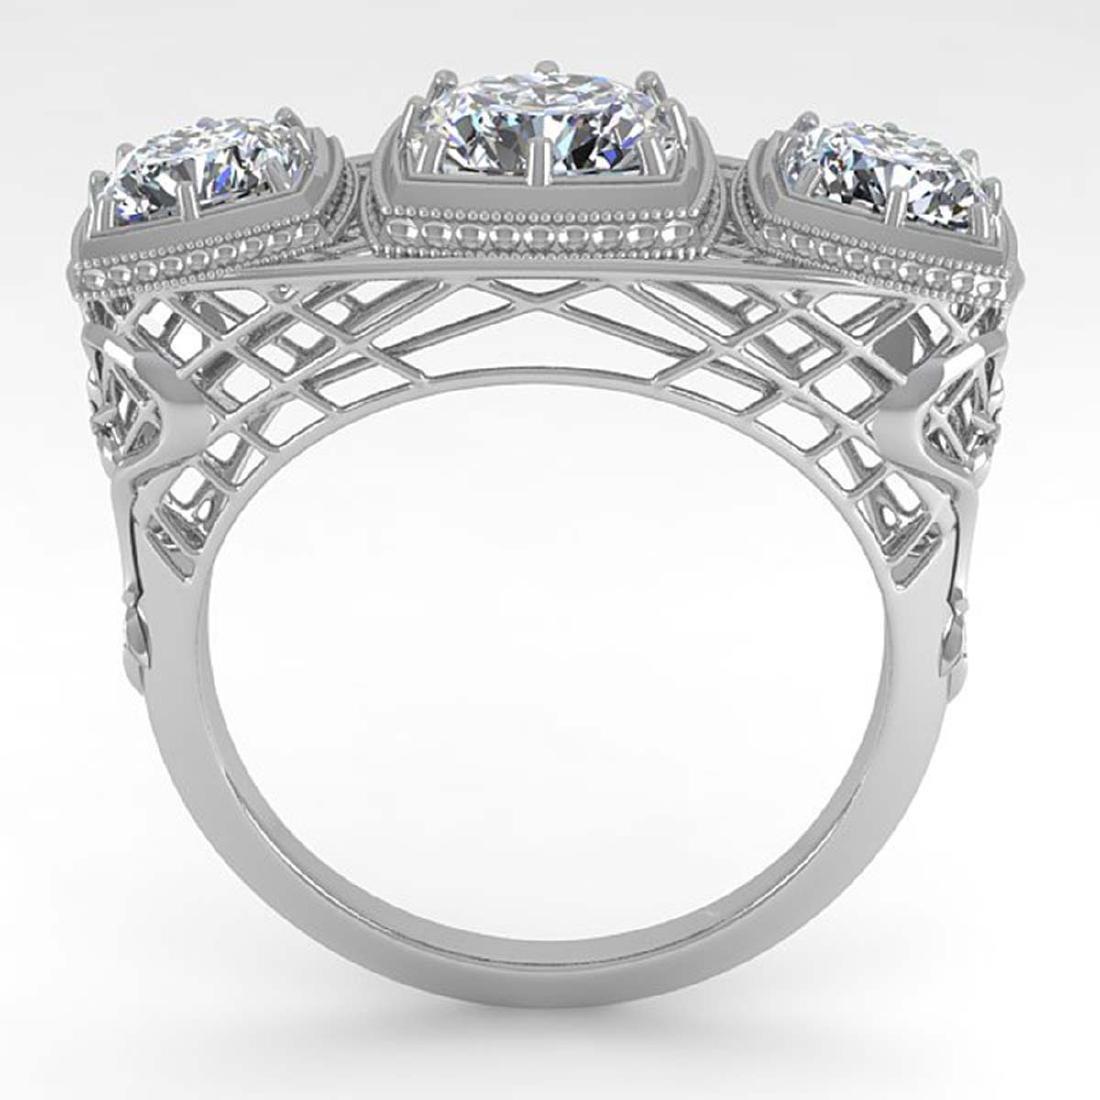 2 CTW VS/SI Cushion Cut Diamond Ring Art Deco 14K White - 3